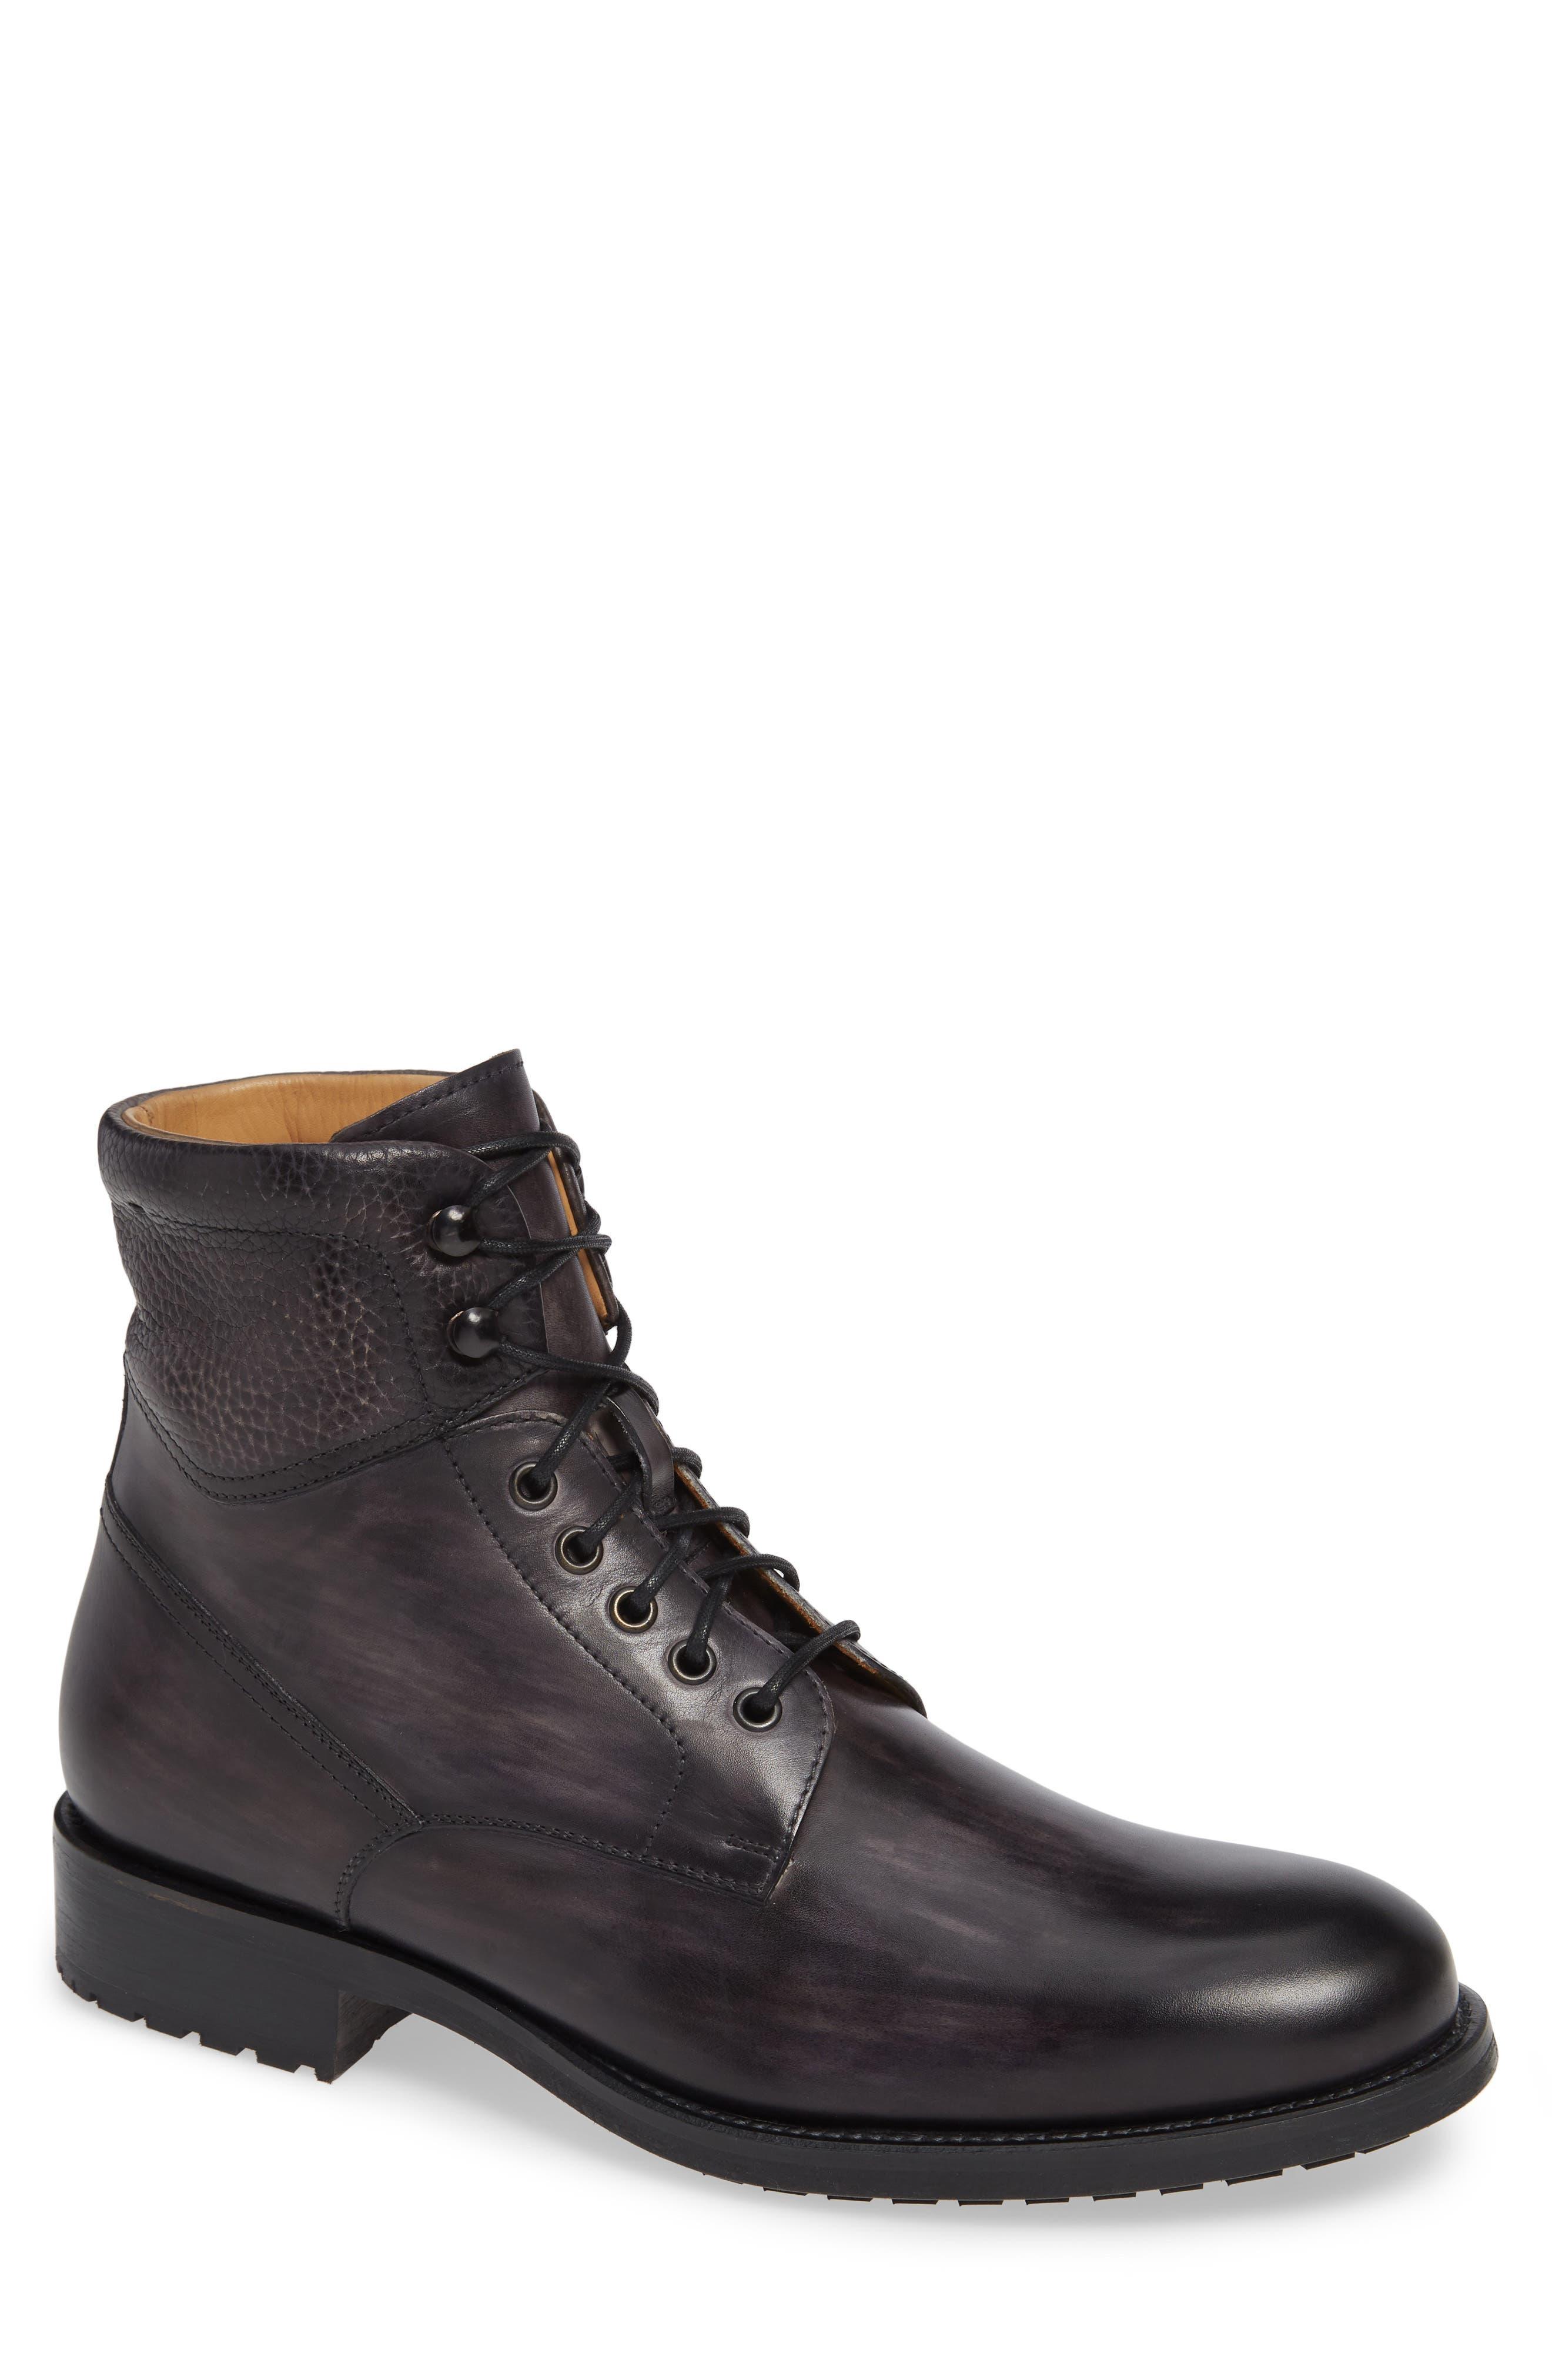 Magnanni Patton Plain Toe Boot, Grey